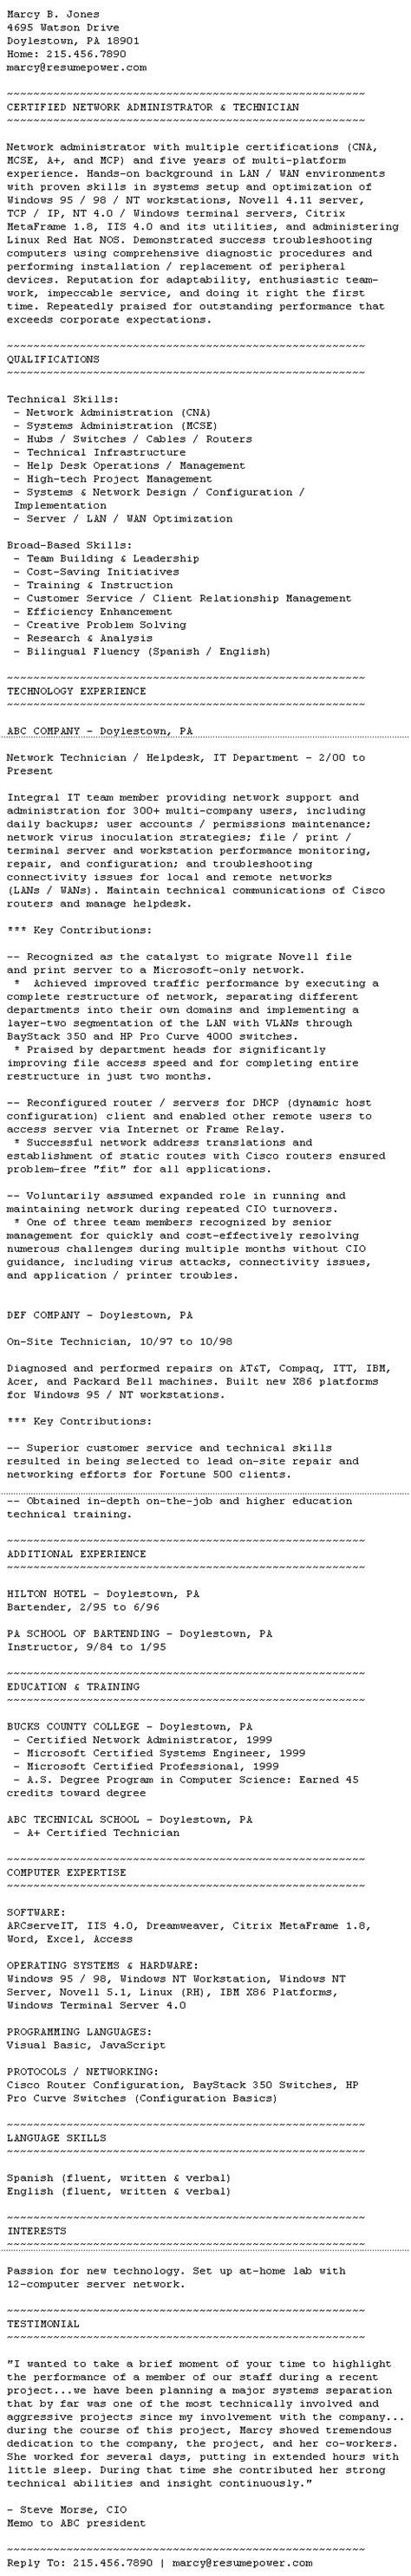 Plain Text Version Of Resume by Ascii Plain Text Resume Sle